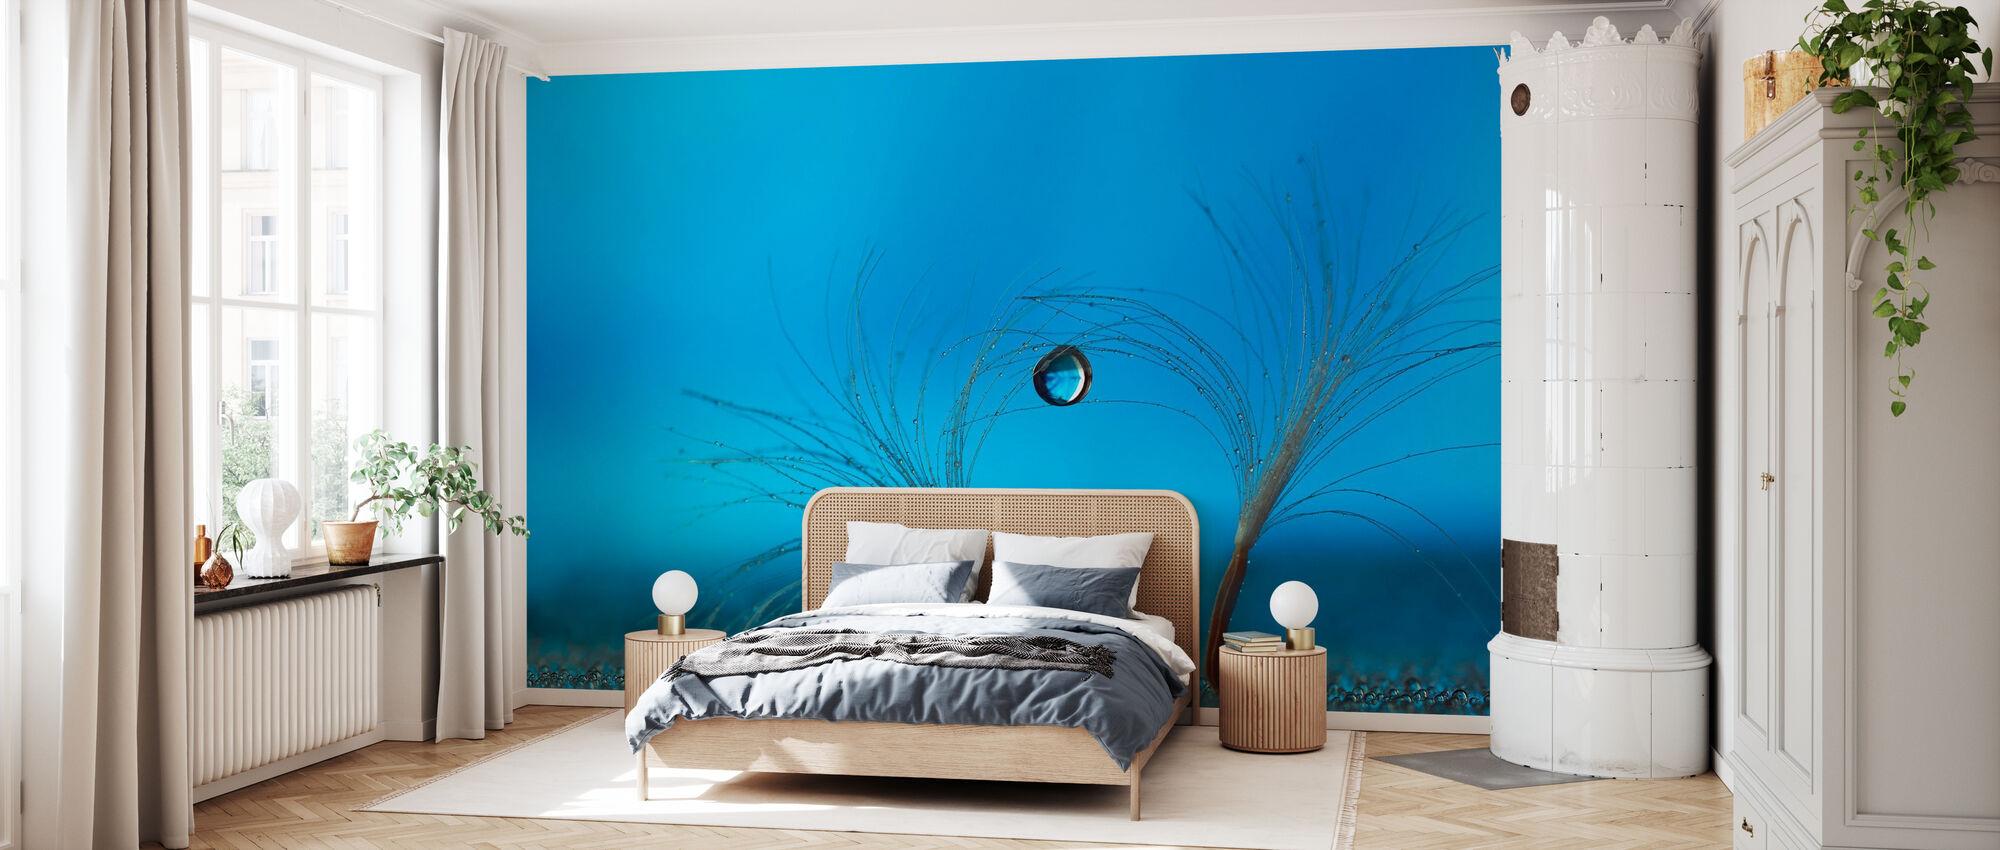 Keep the Balance - Wallpaper - Bedroom